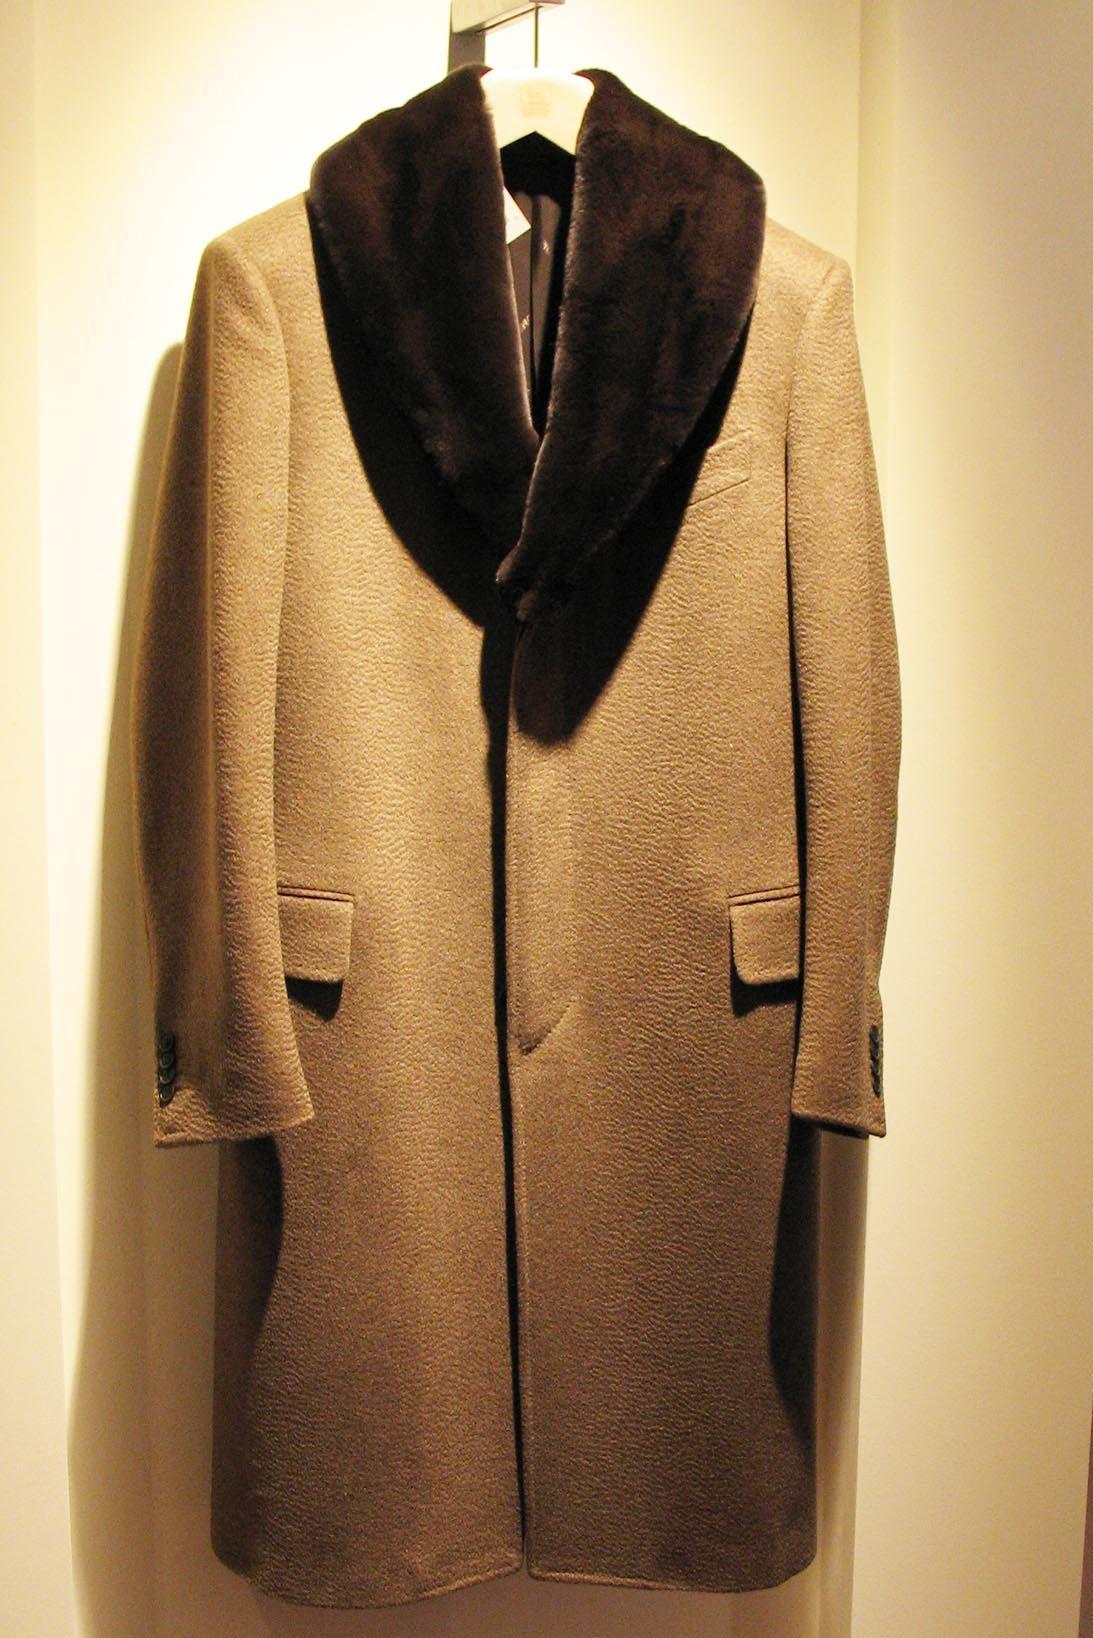 vicuña and mink overcoat dc9c9cb14b0